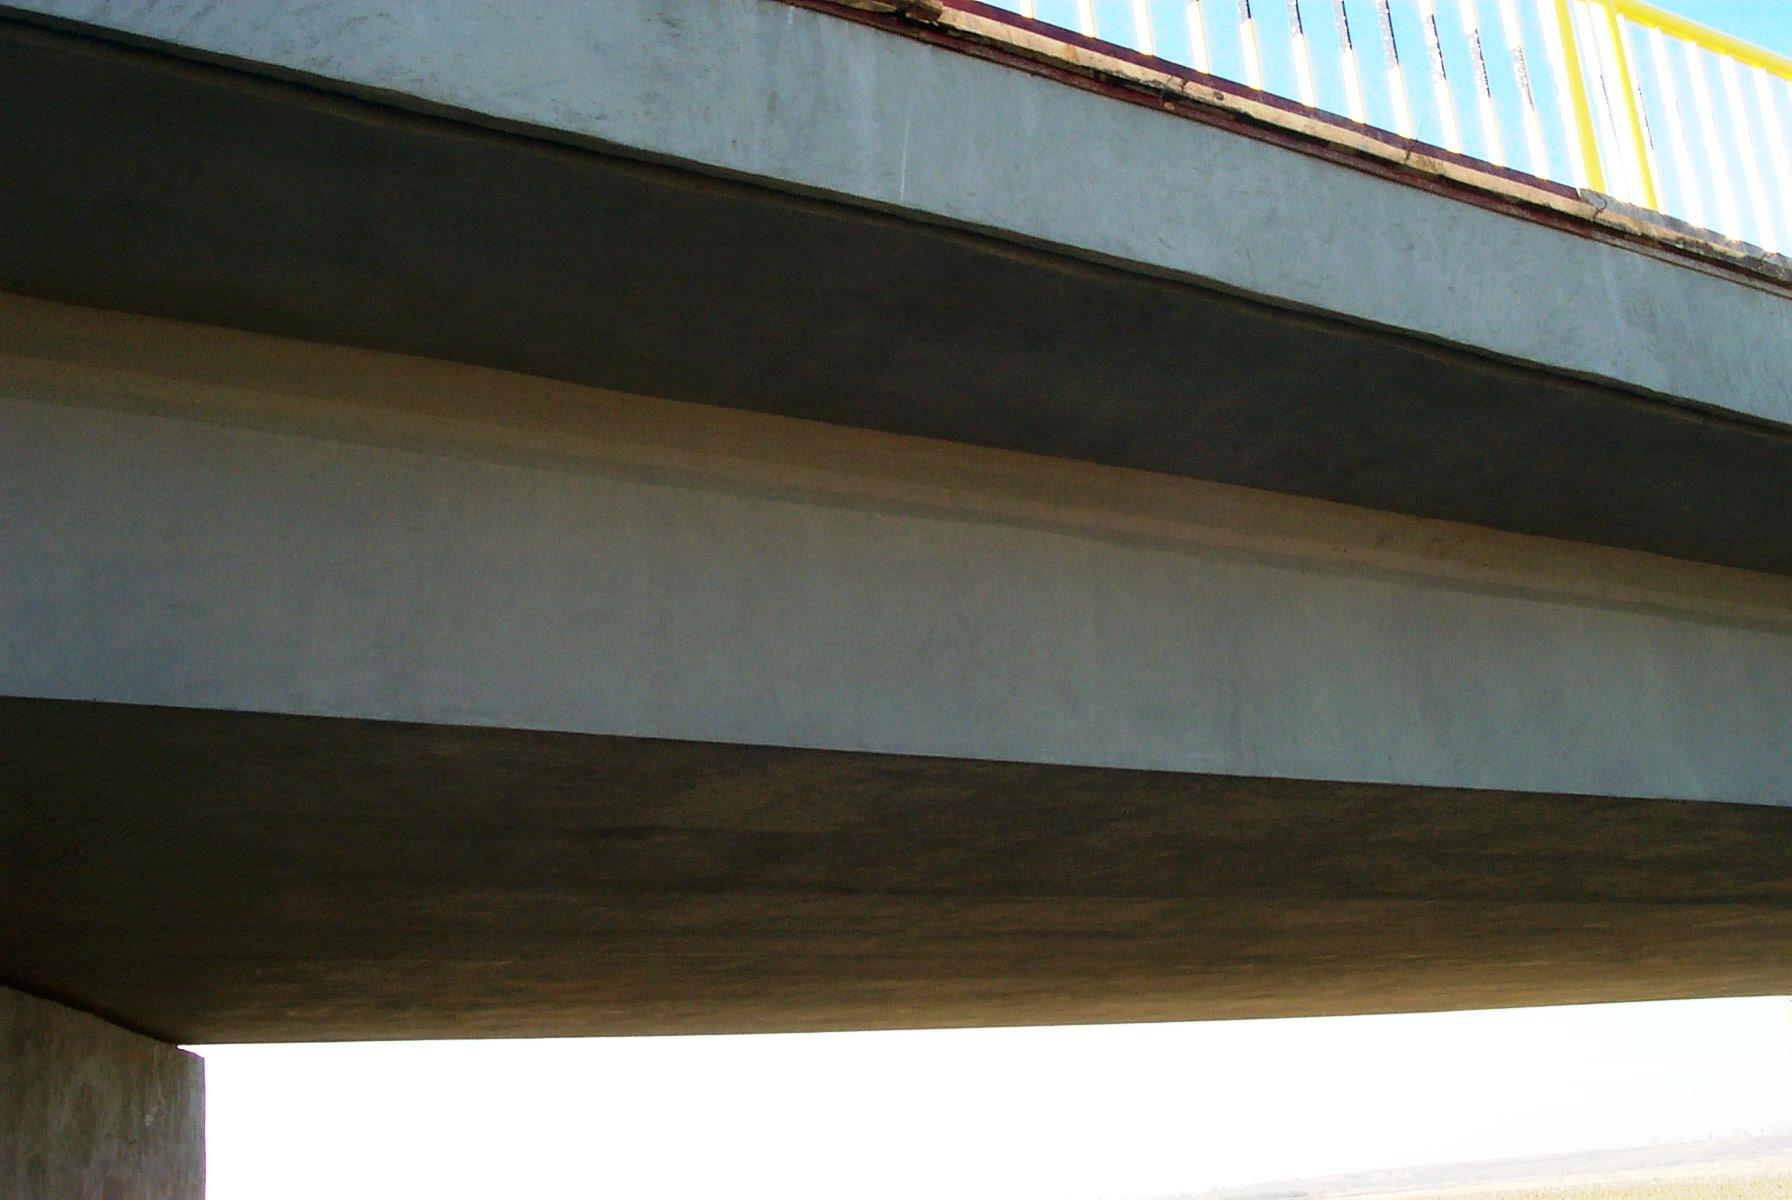 Reparatii pod (DN2), Km. 33 - 028, peste raul Calnistea MAPEI - Poza 122